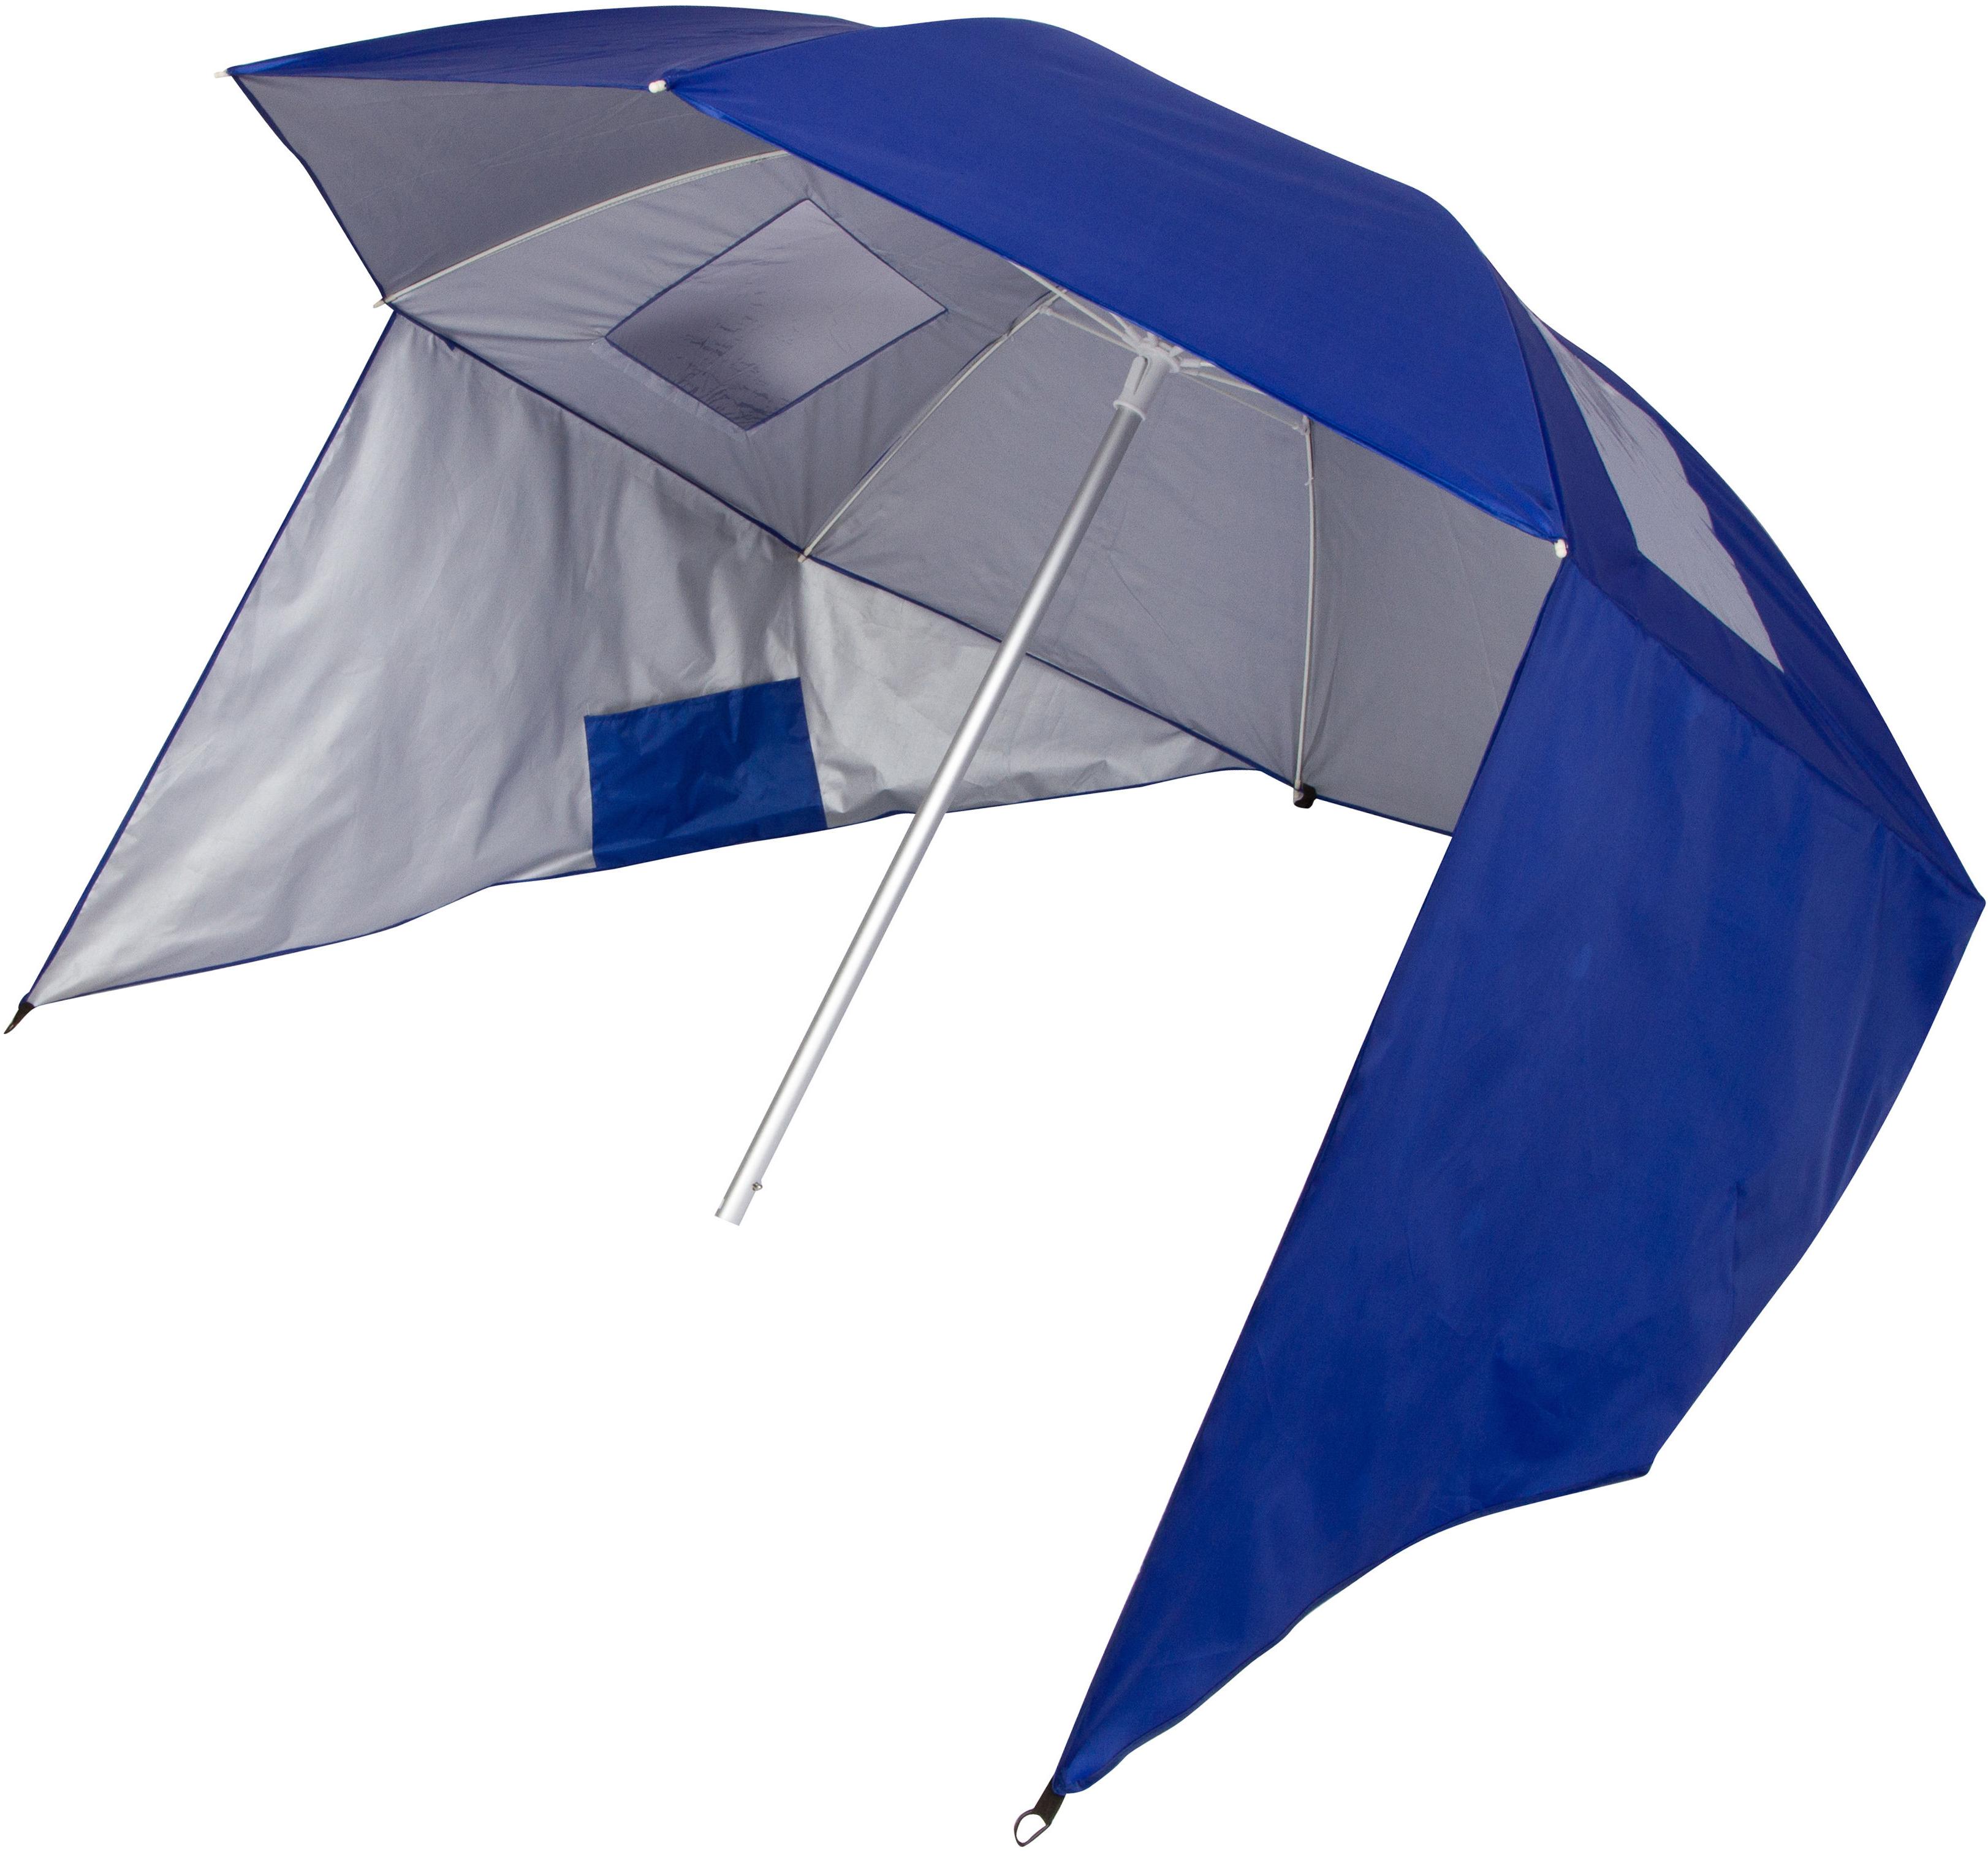 Tiara Sun Shelter 50+ Uv Protection 7' Beach Umbrella Inside Recent Alyson Joeshade Beach Umbrellas (View 19 of 20)